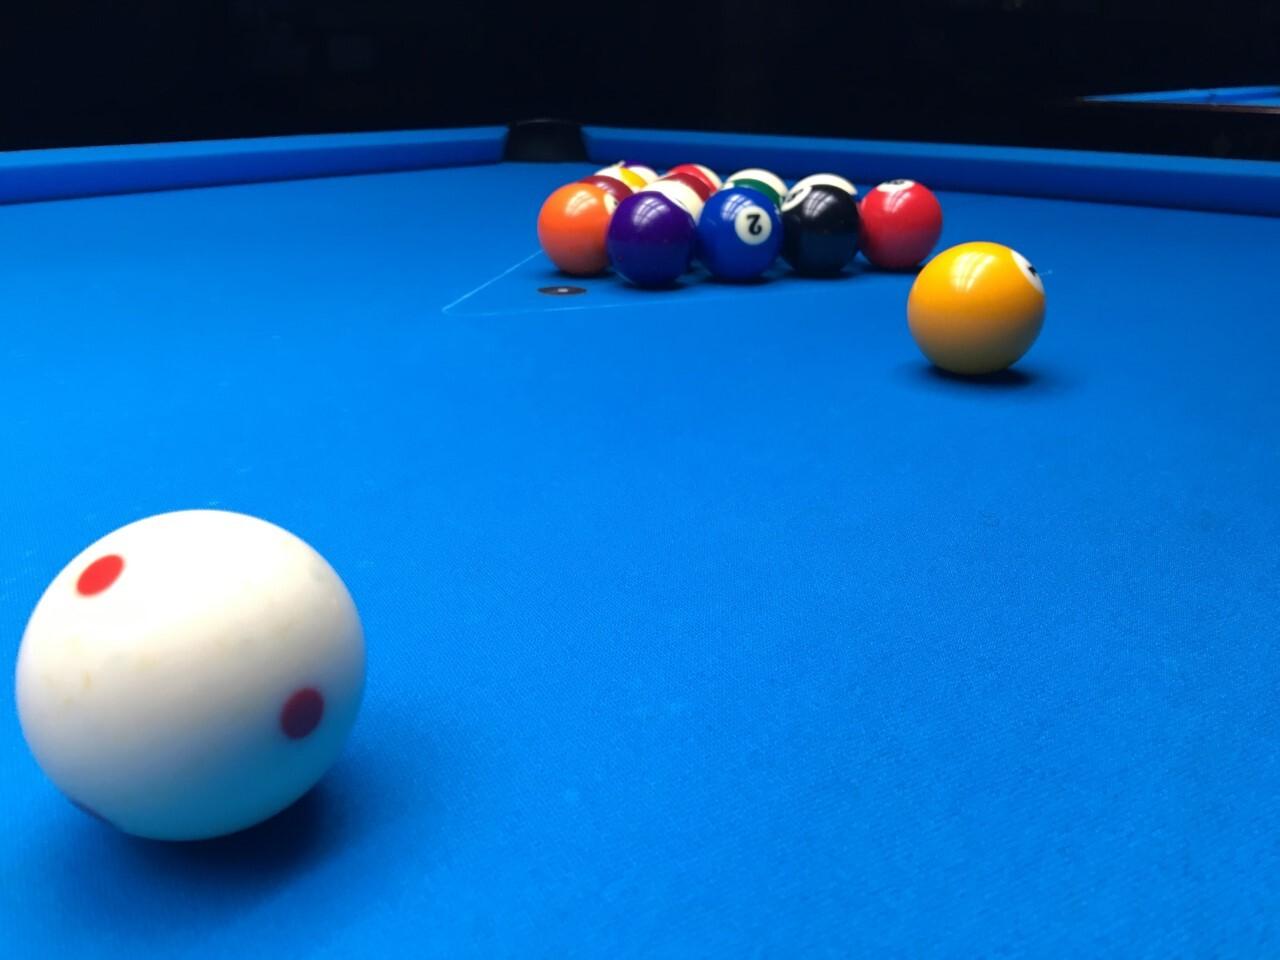 Photos: Hampton Roads plays host to major billiardscompetitions